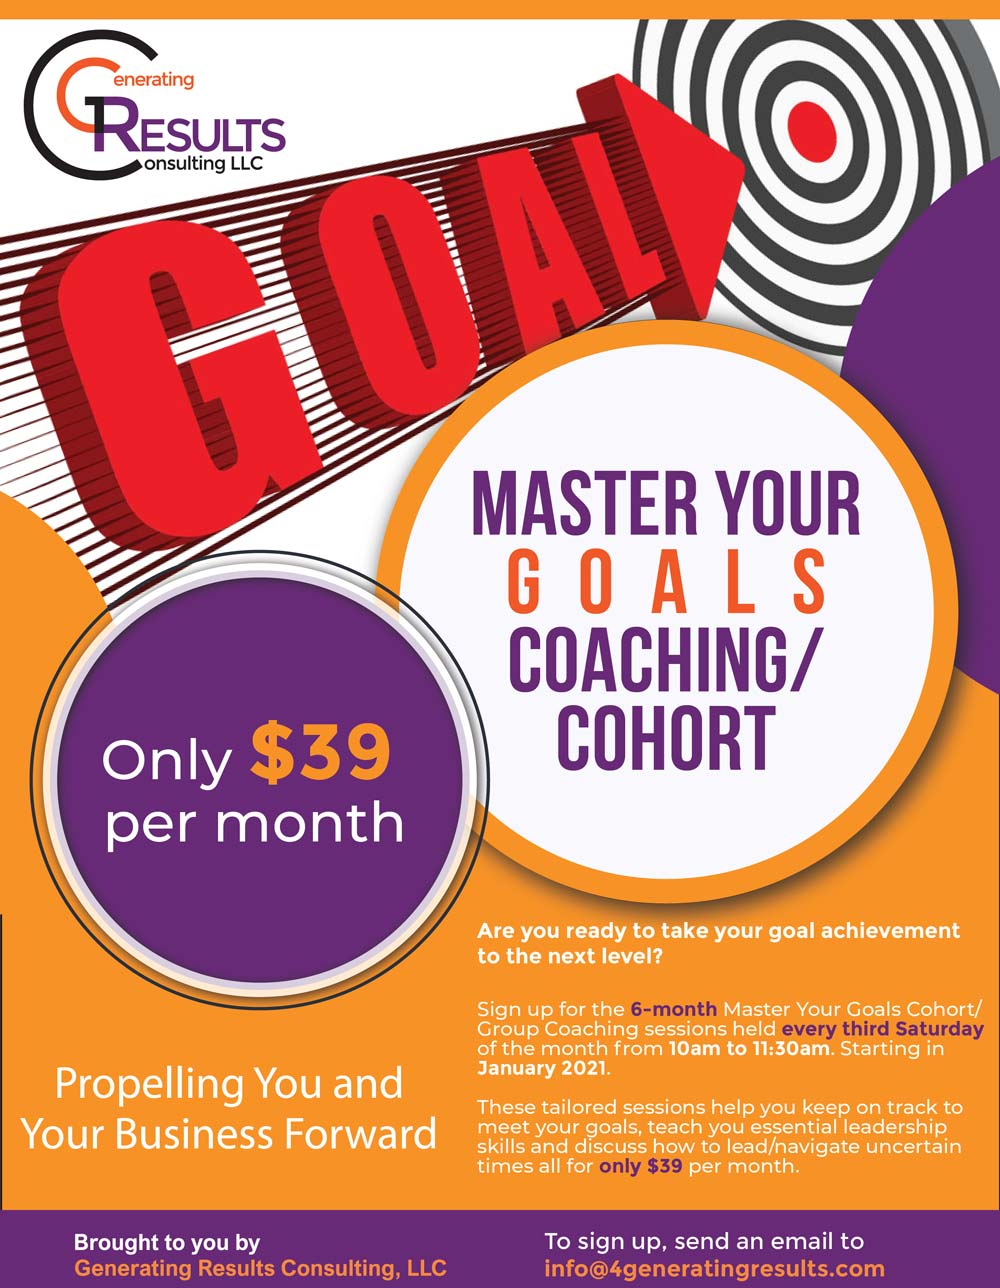 Master Your Goals Coaching/Cohort